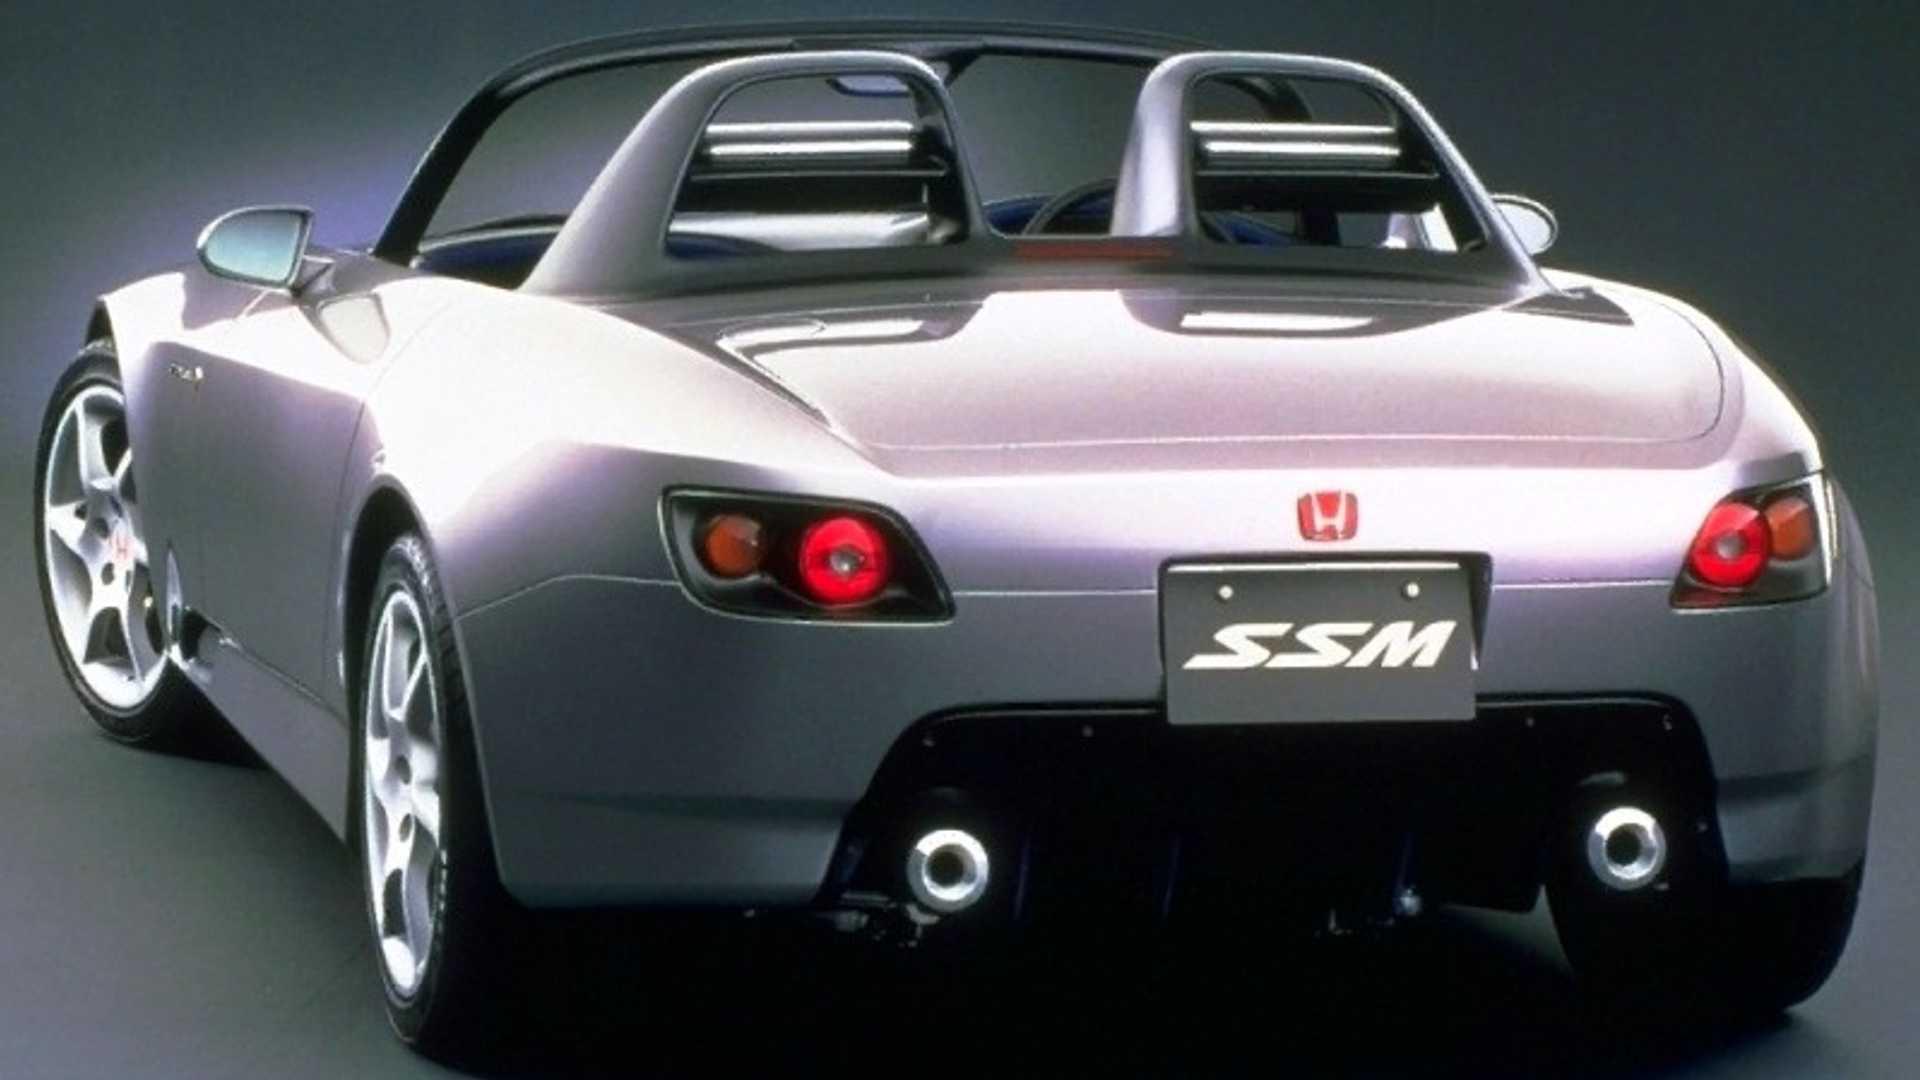 1995-honda-ssm-concept-1